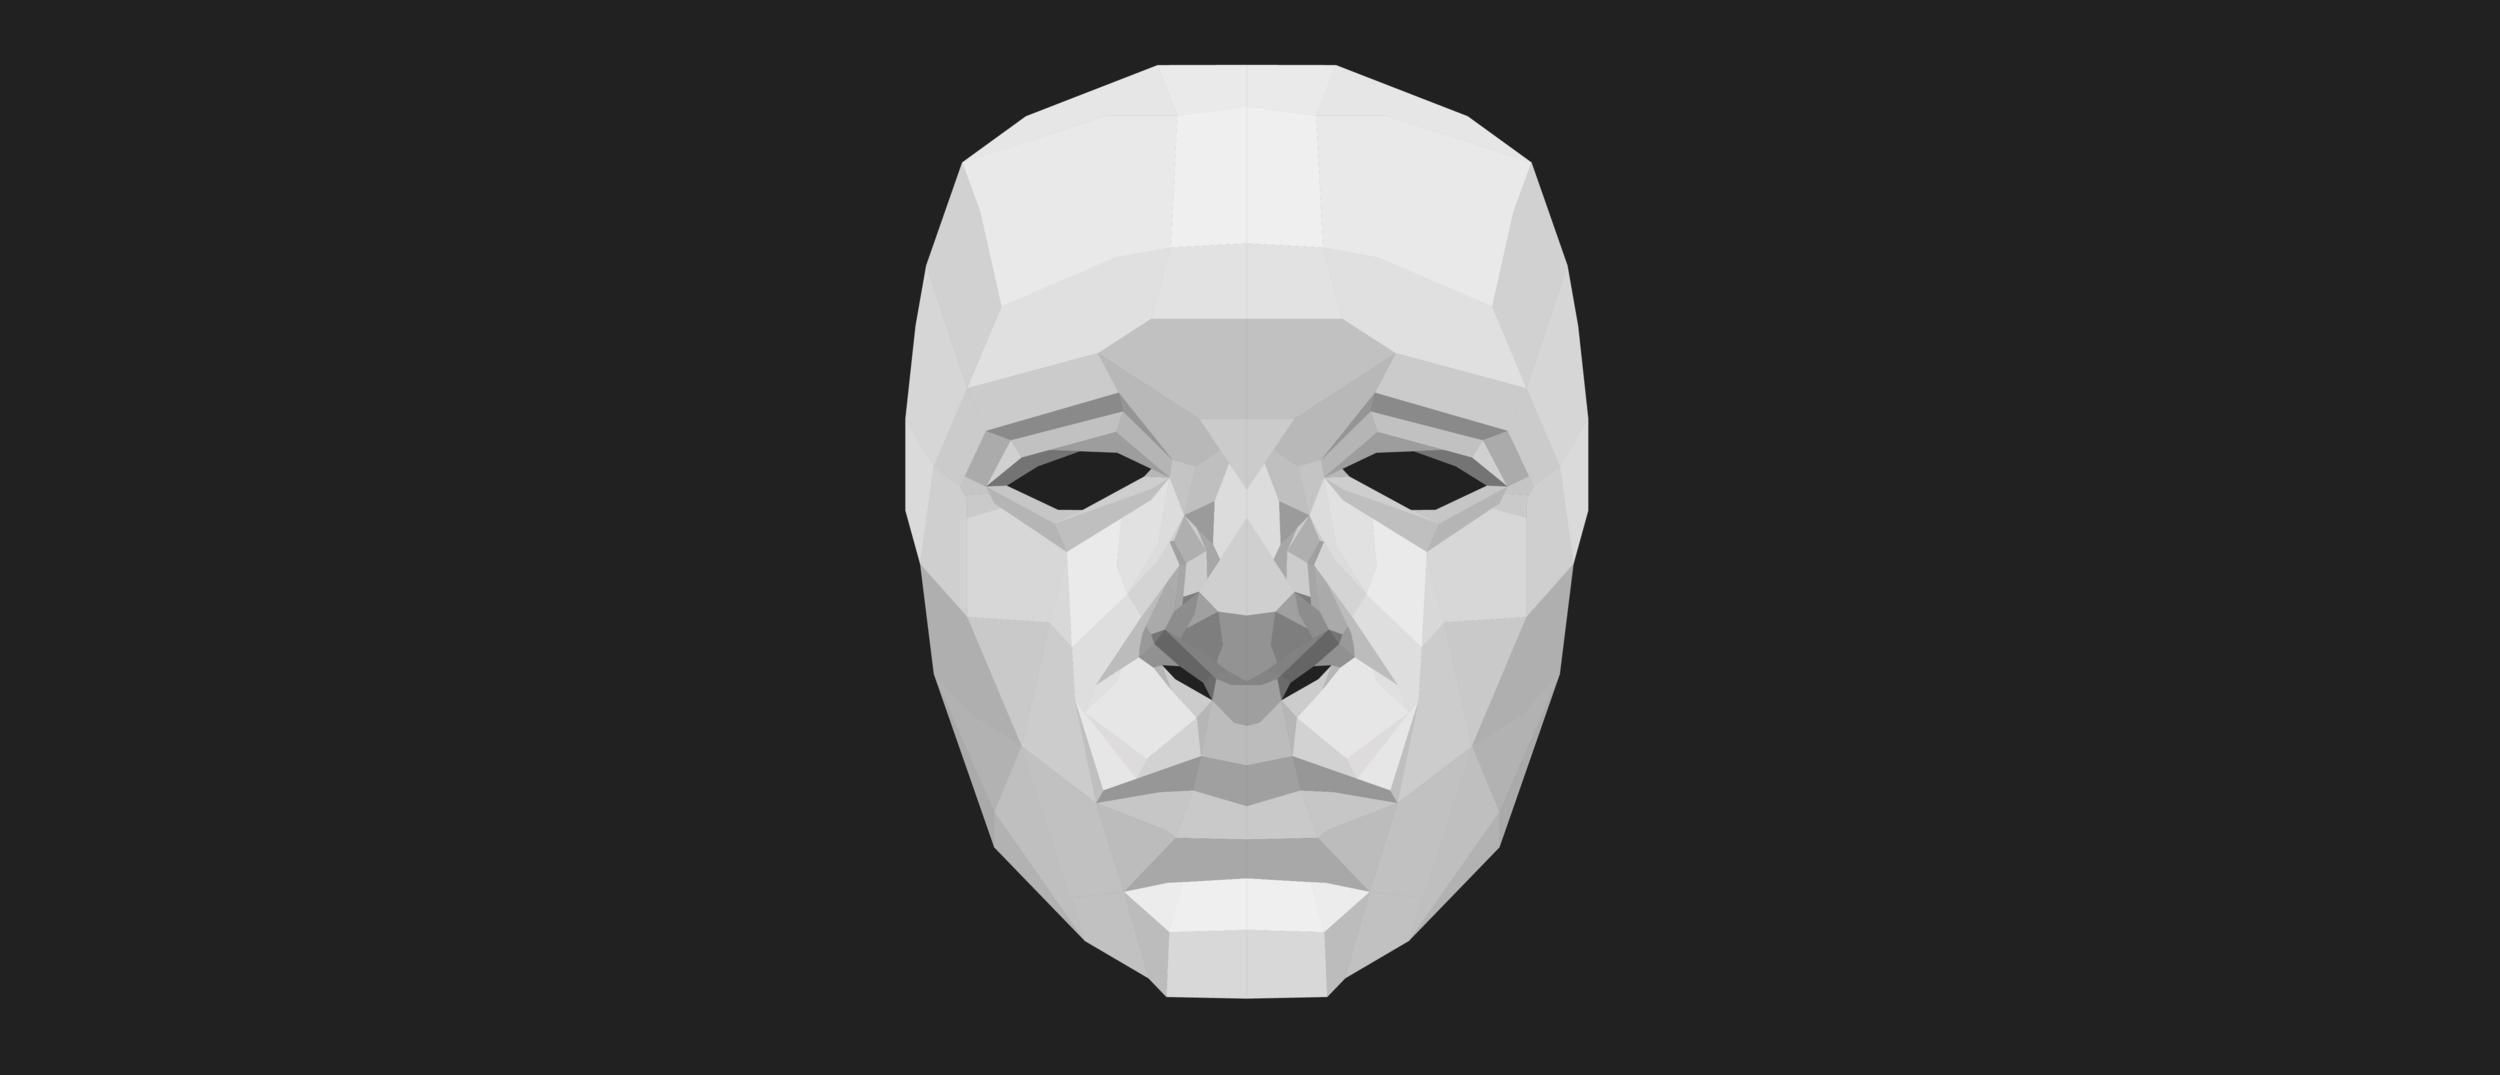 human-01.png